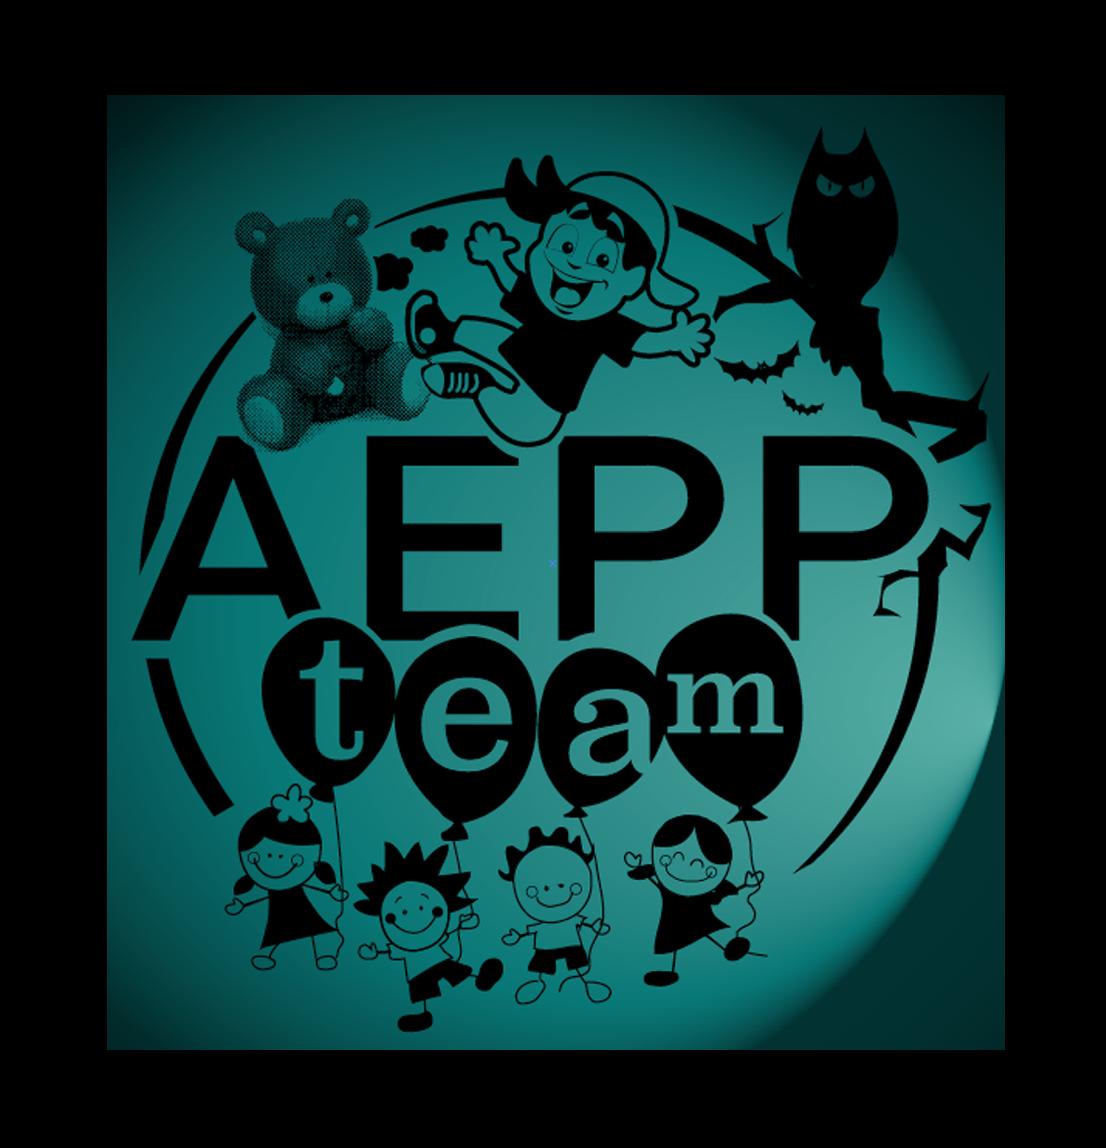 AEPP TEAM